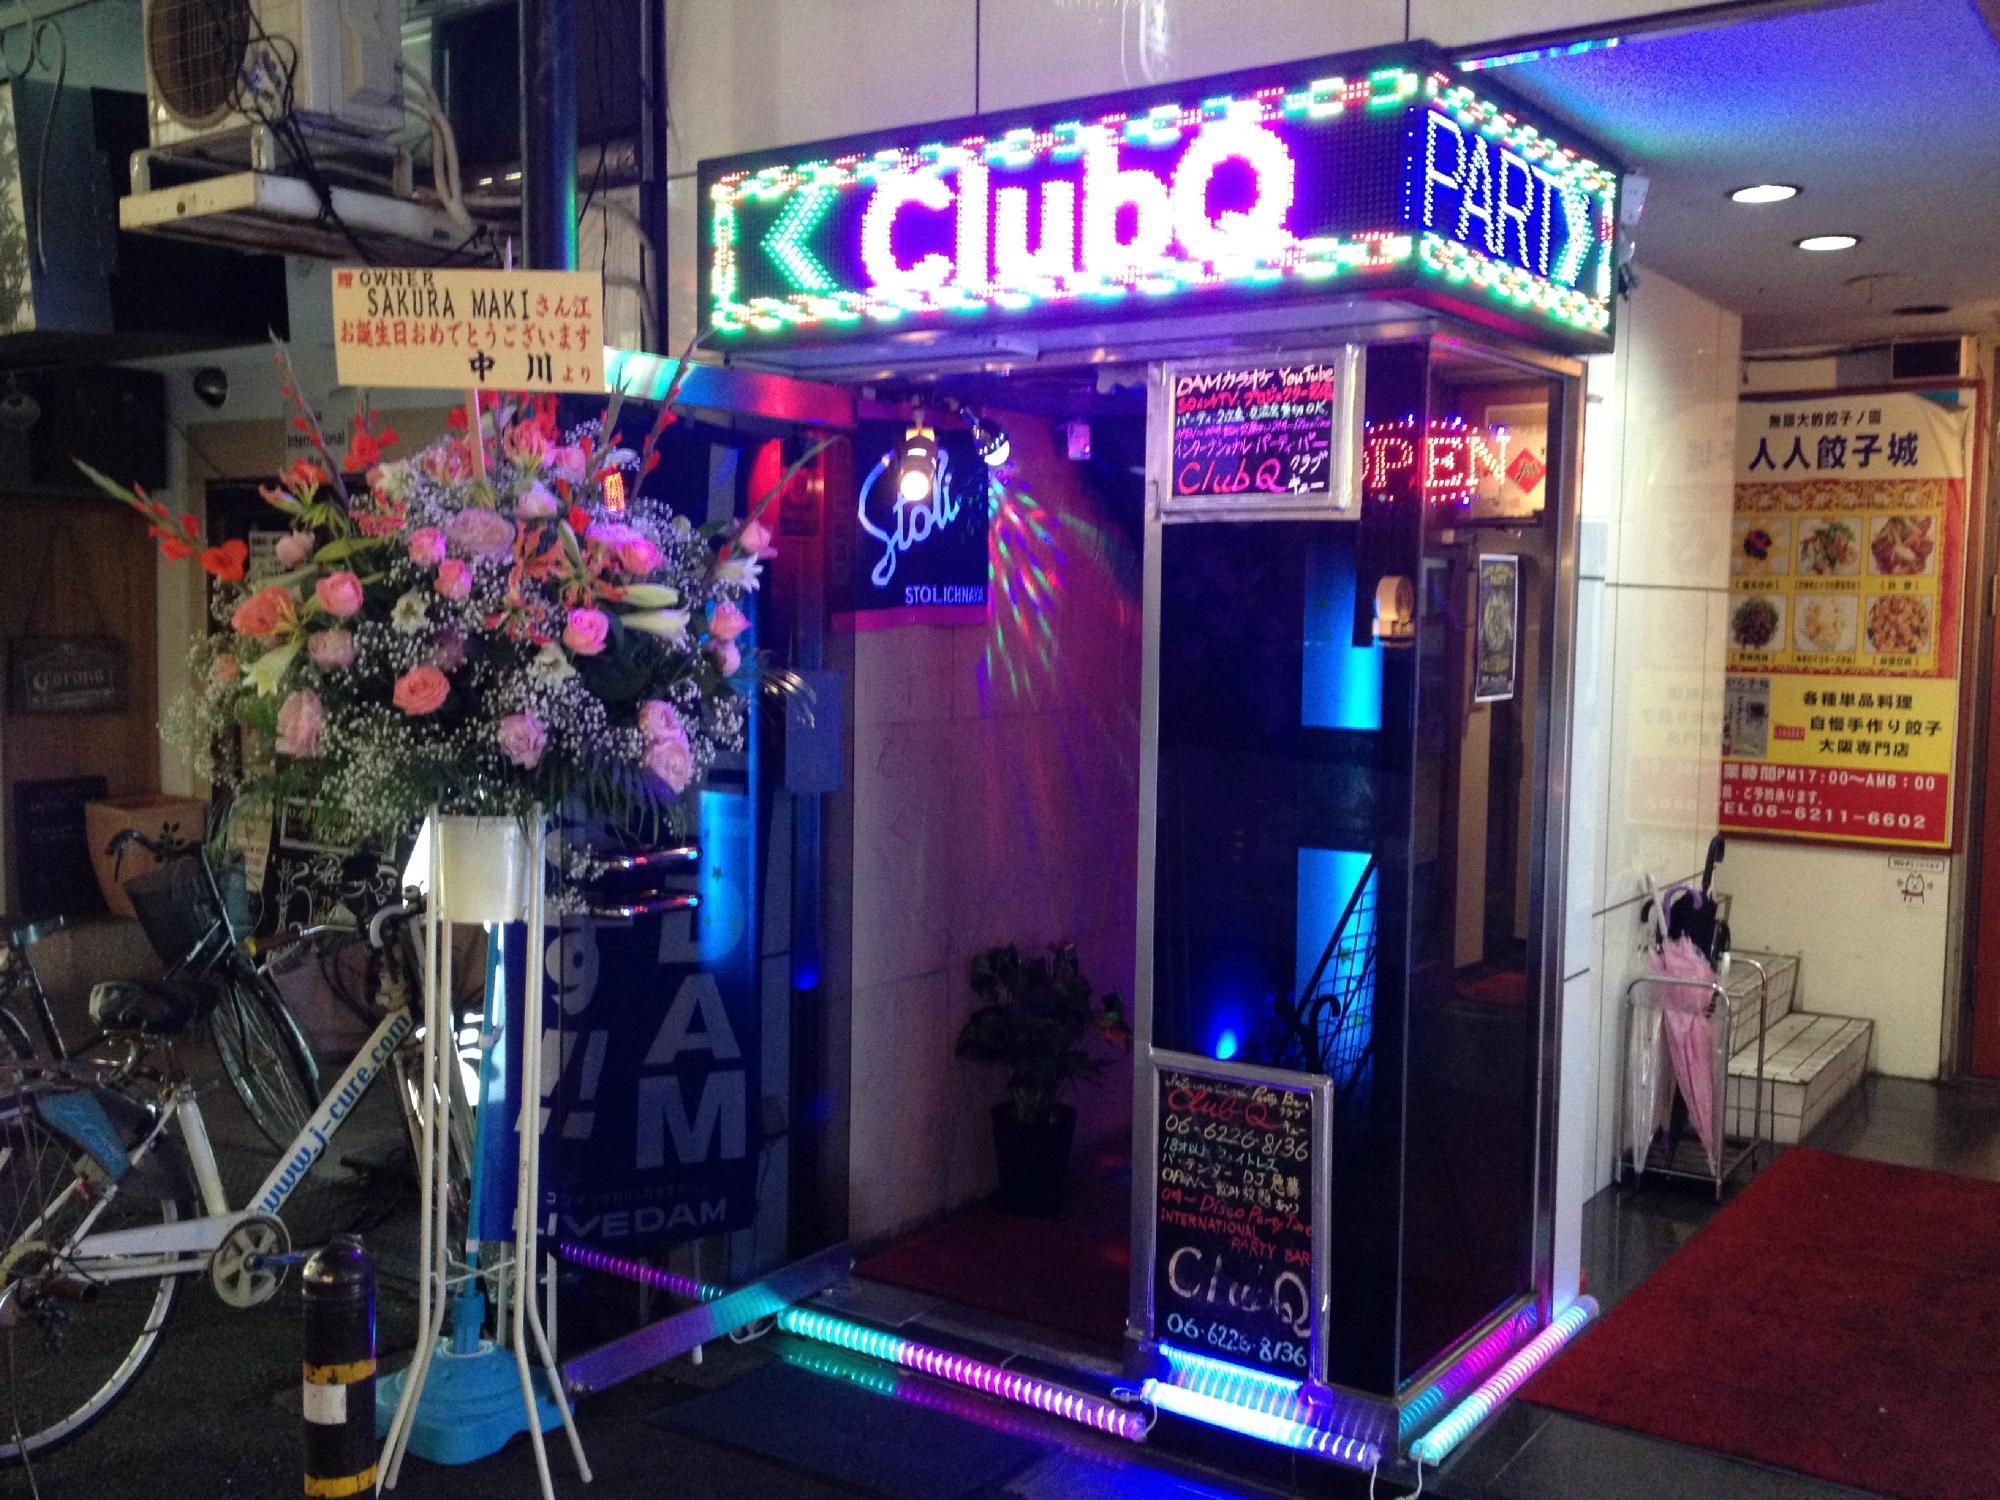 OSAKA DANCE CLUBS Club-q-international